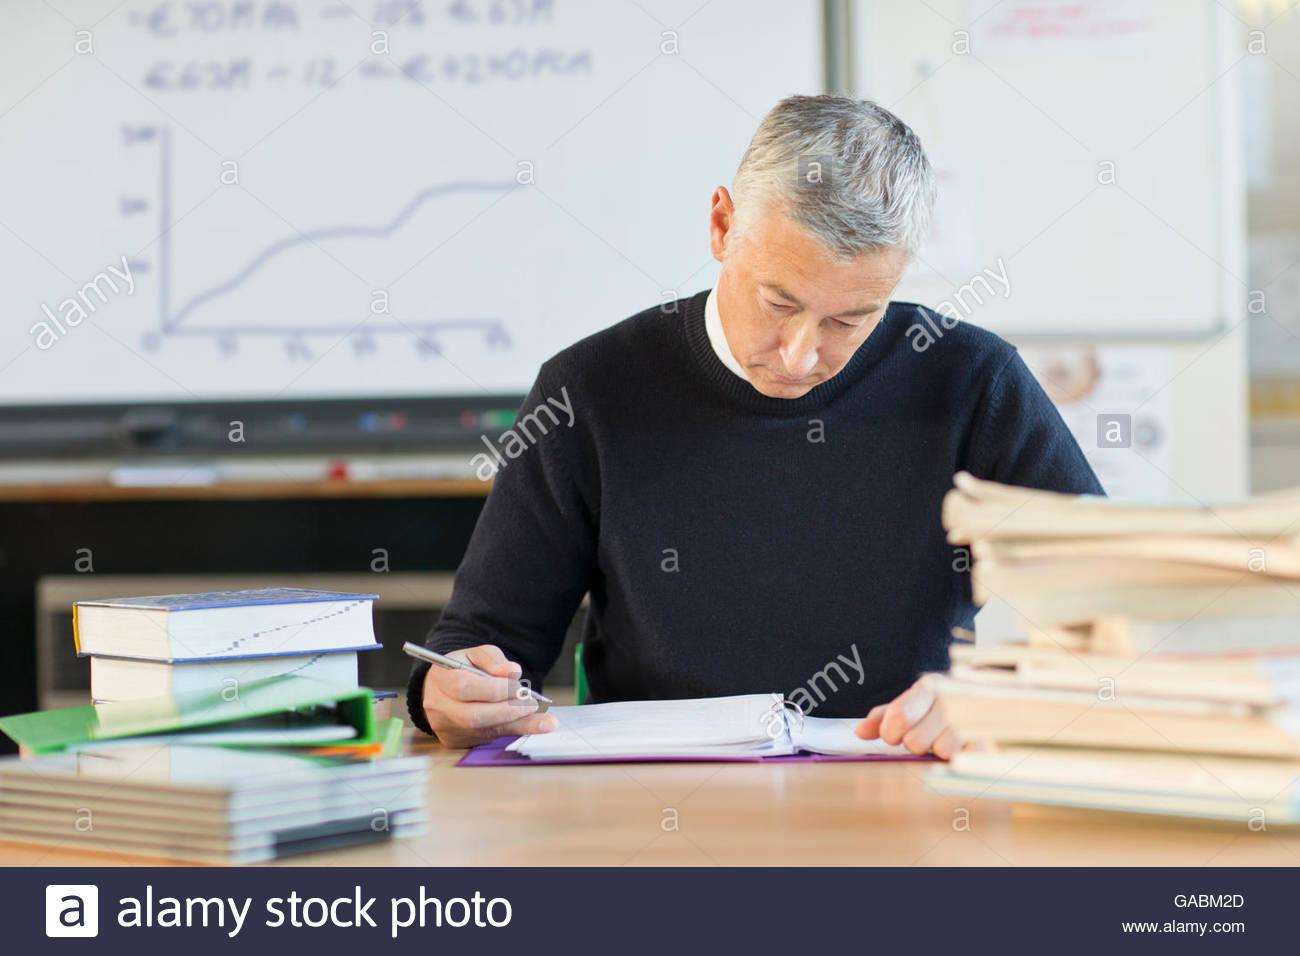 Teacher grading homework in classroom - Stock Image